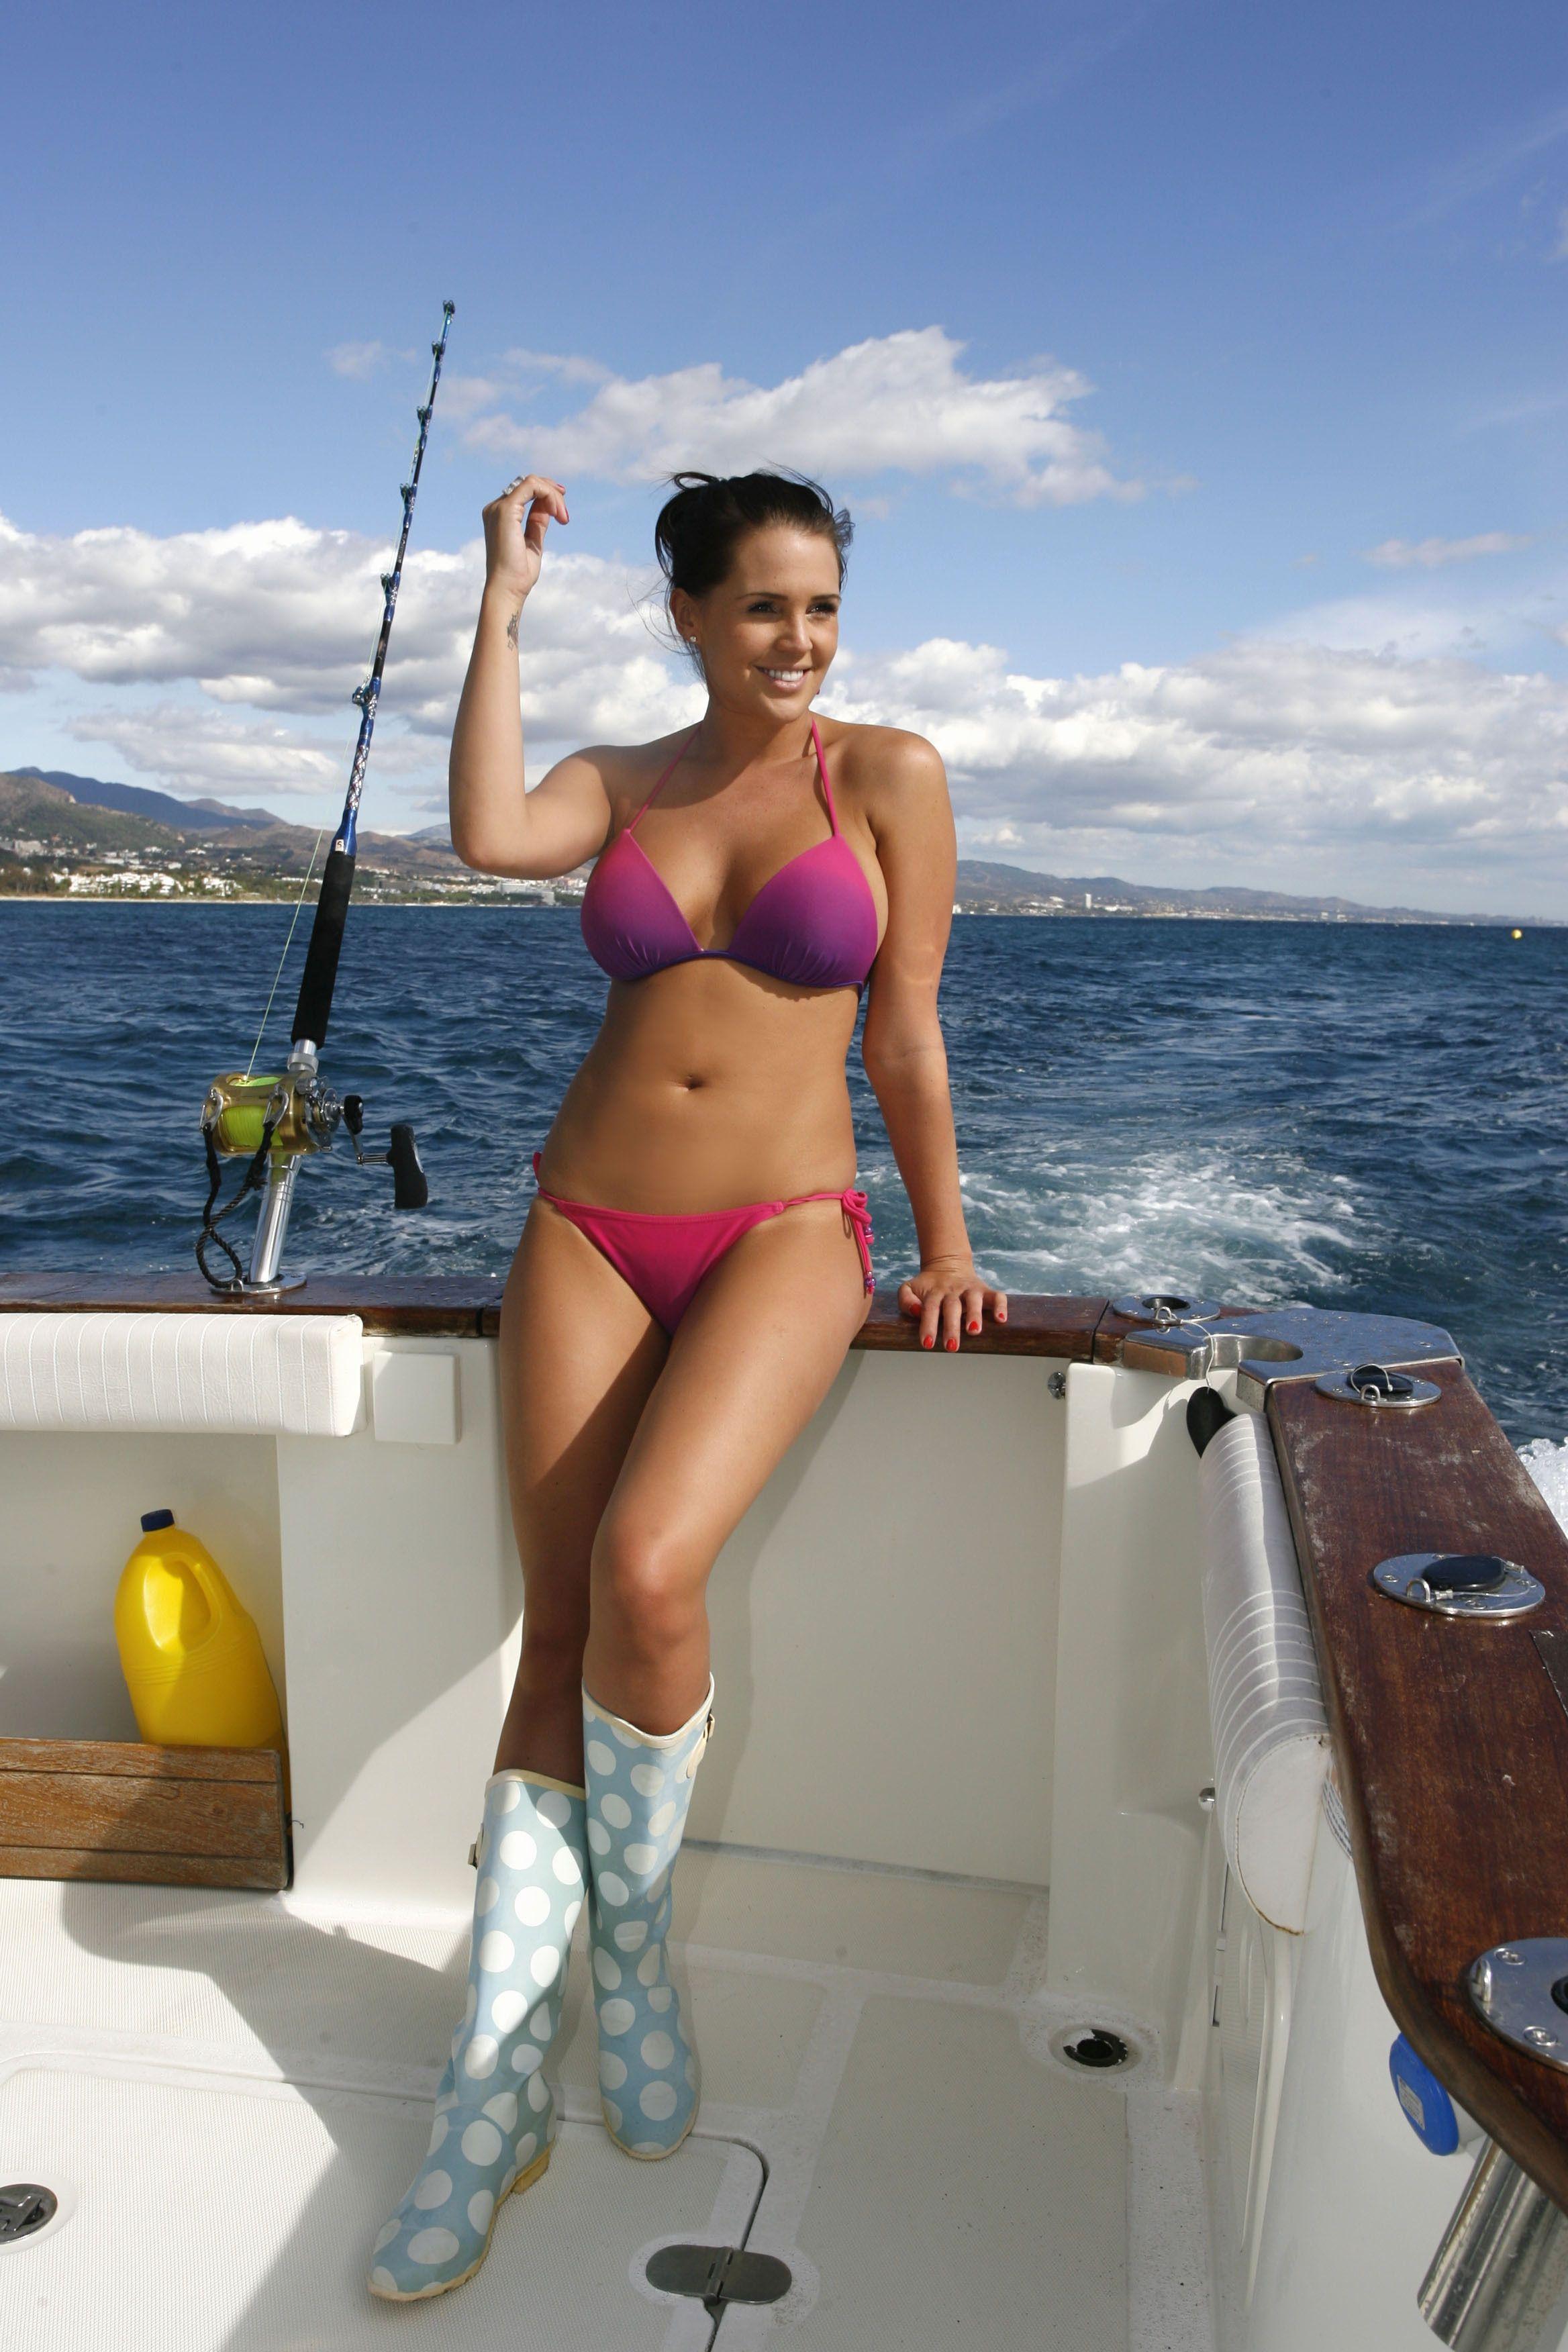 Danielle Lloyd Nude 5 PUBLIC IMAGES